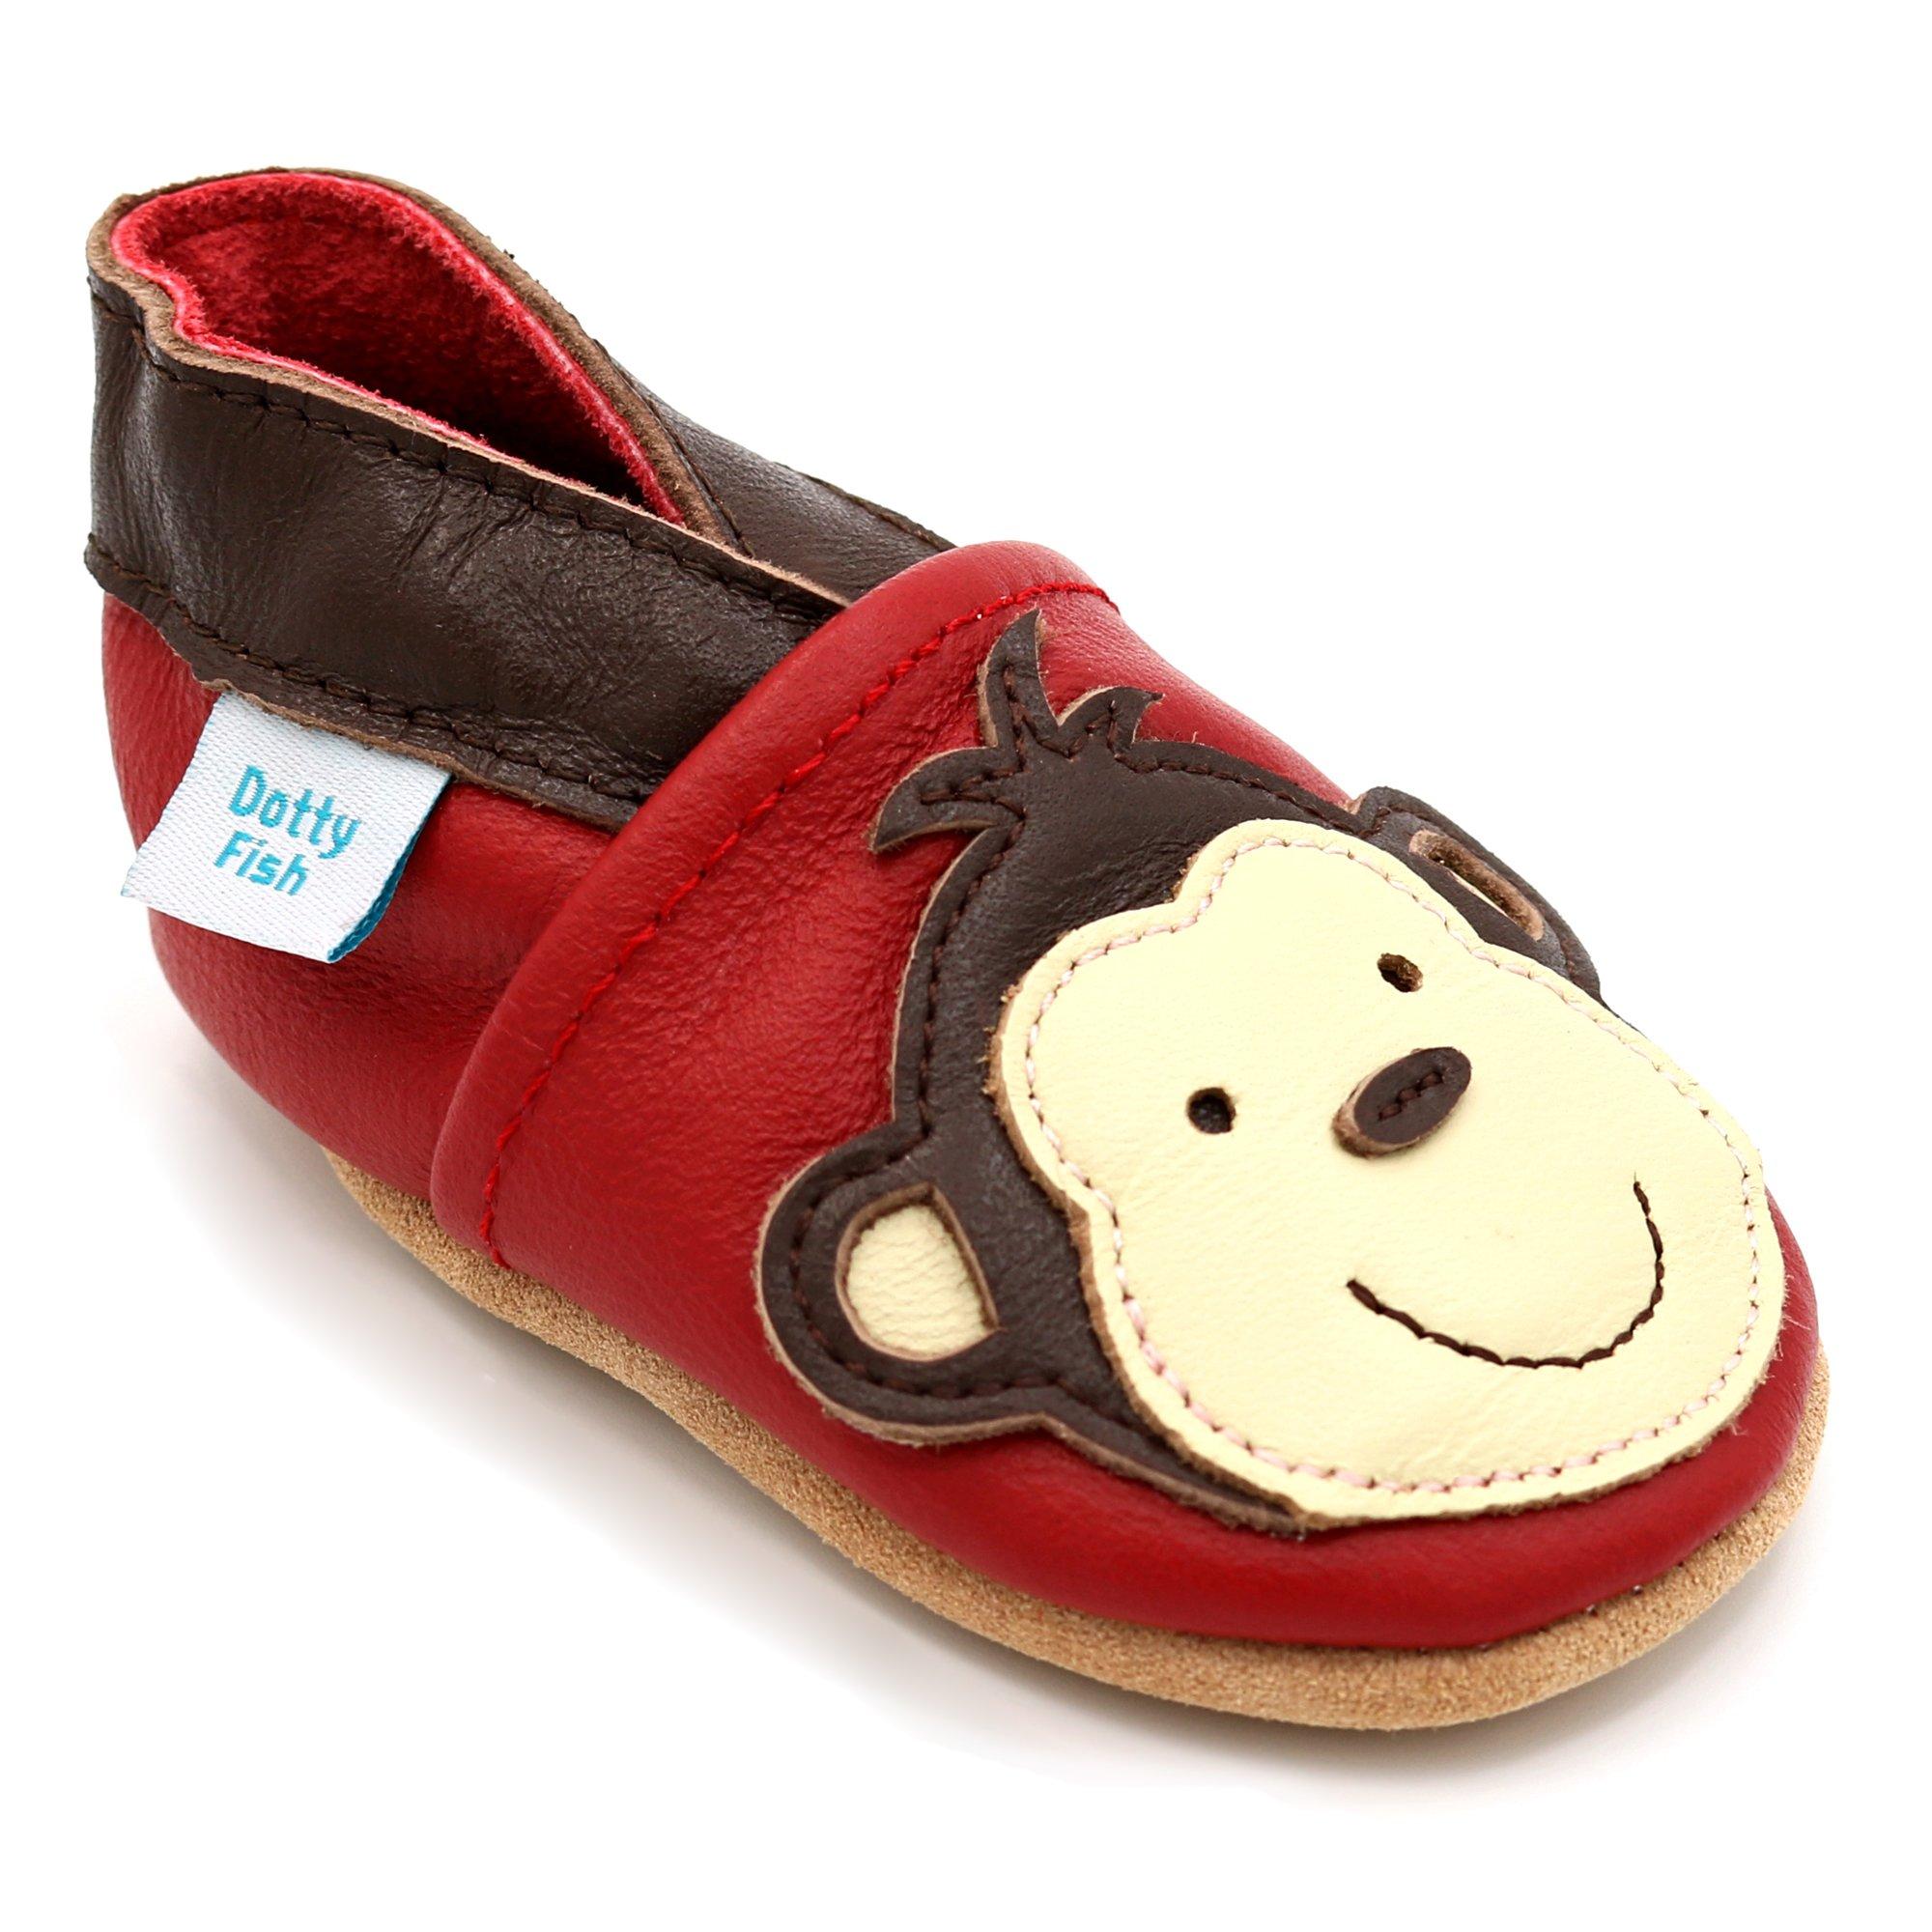 2cda2f93514d6 Dotty Fish - Chaussures Cuir Souple bébé et Bambin - Garçons - Animaux  product image